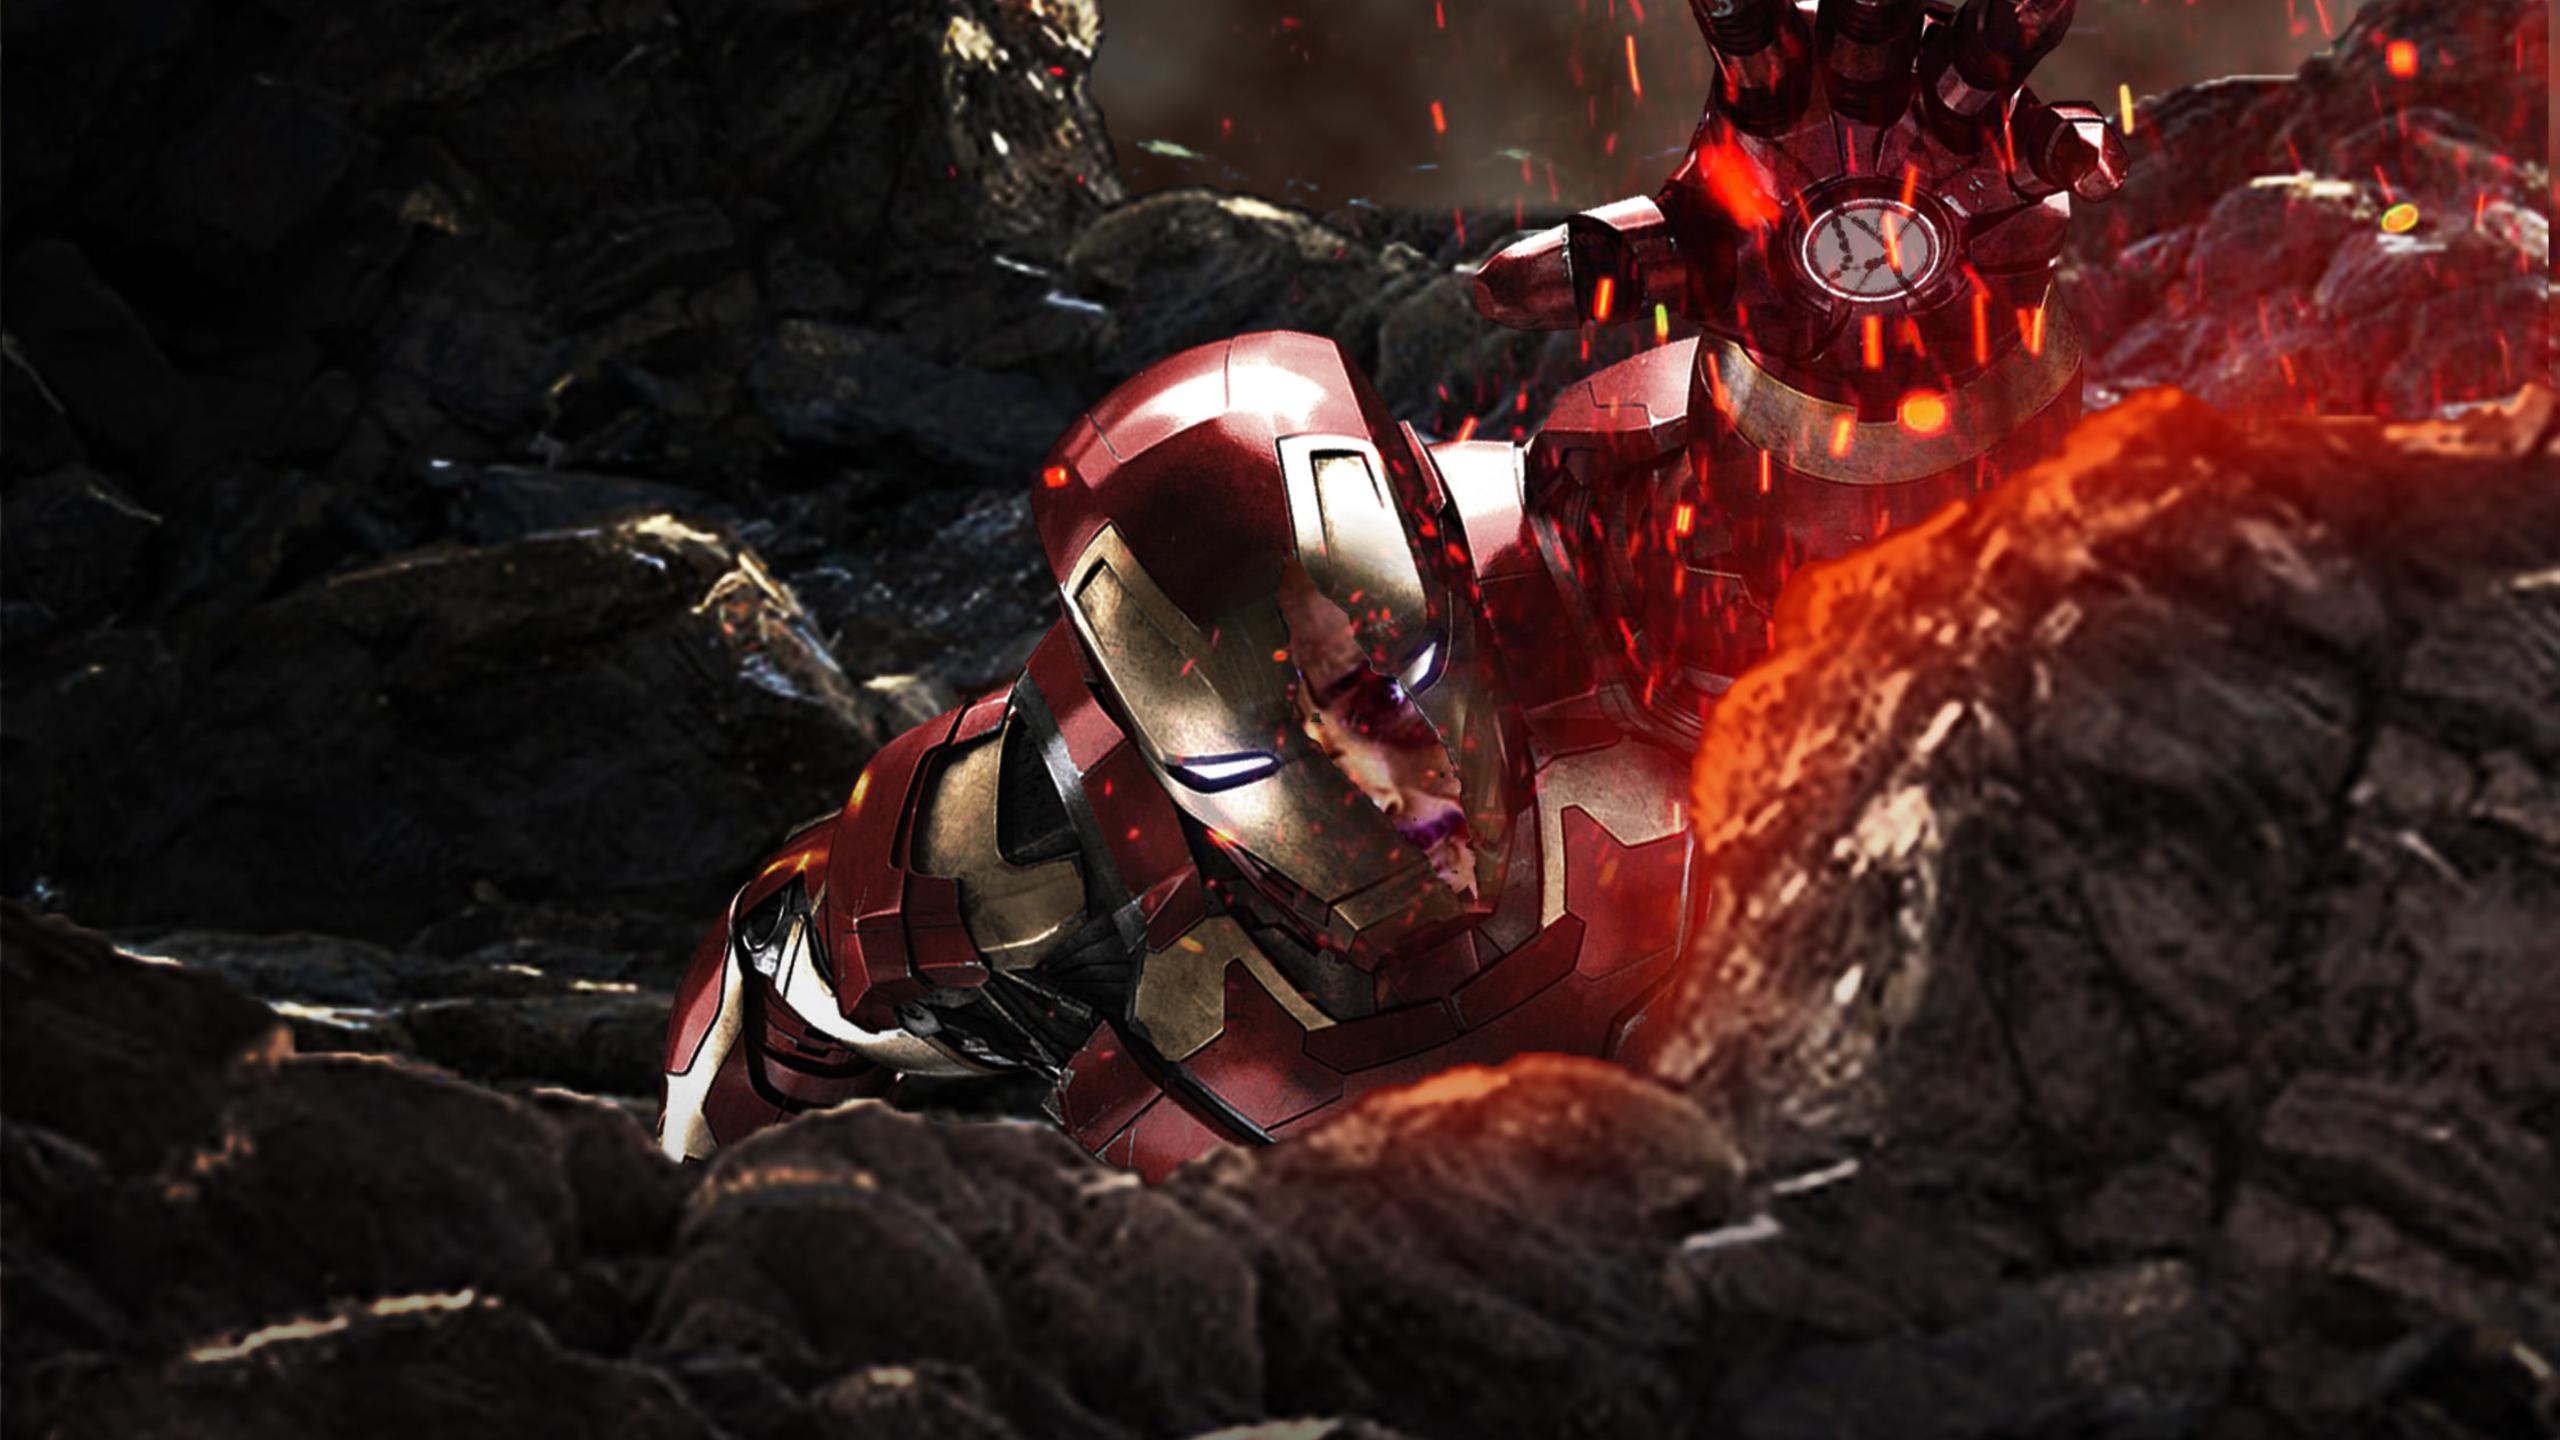 2560x1440 iron man in avengers infinity war 1440p resolution hd 4k wallpapers images - Iron man wallpaper 4k ...